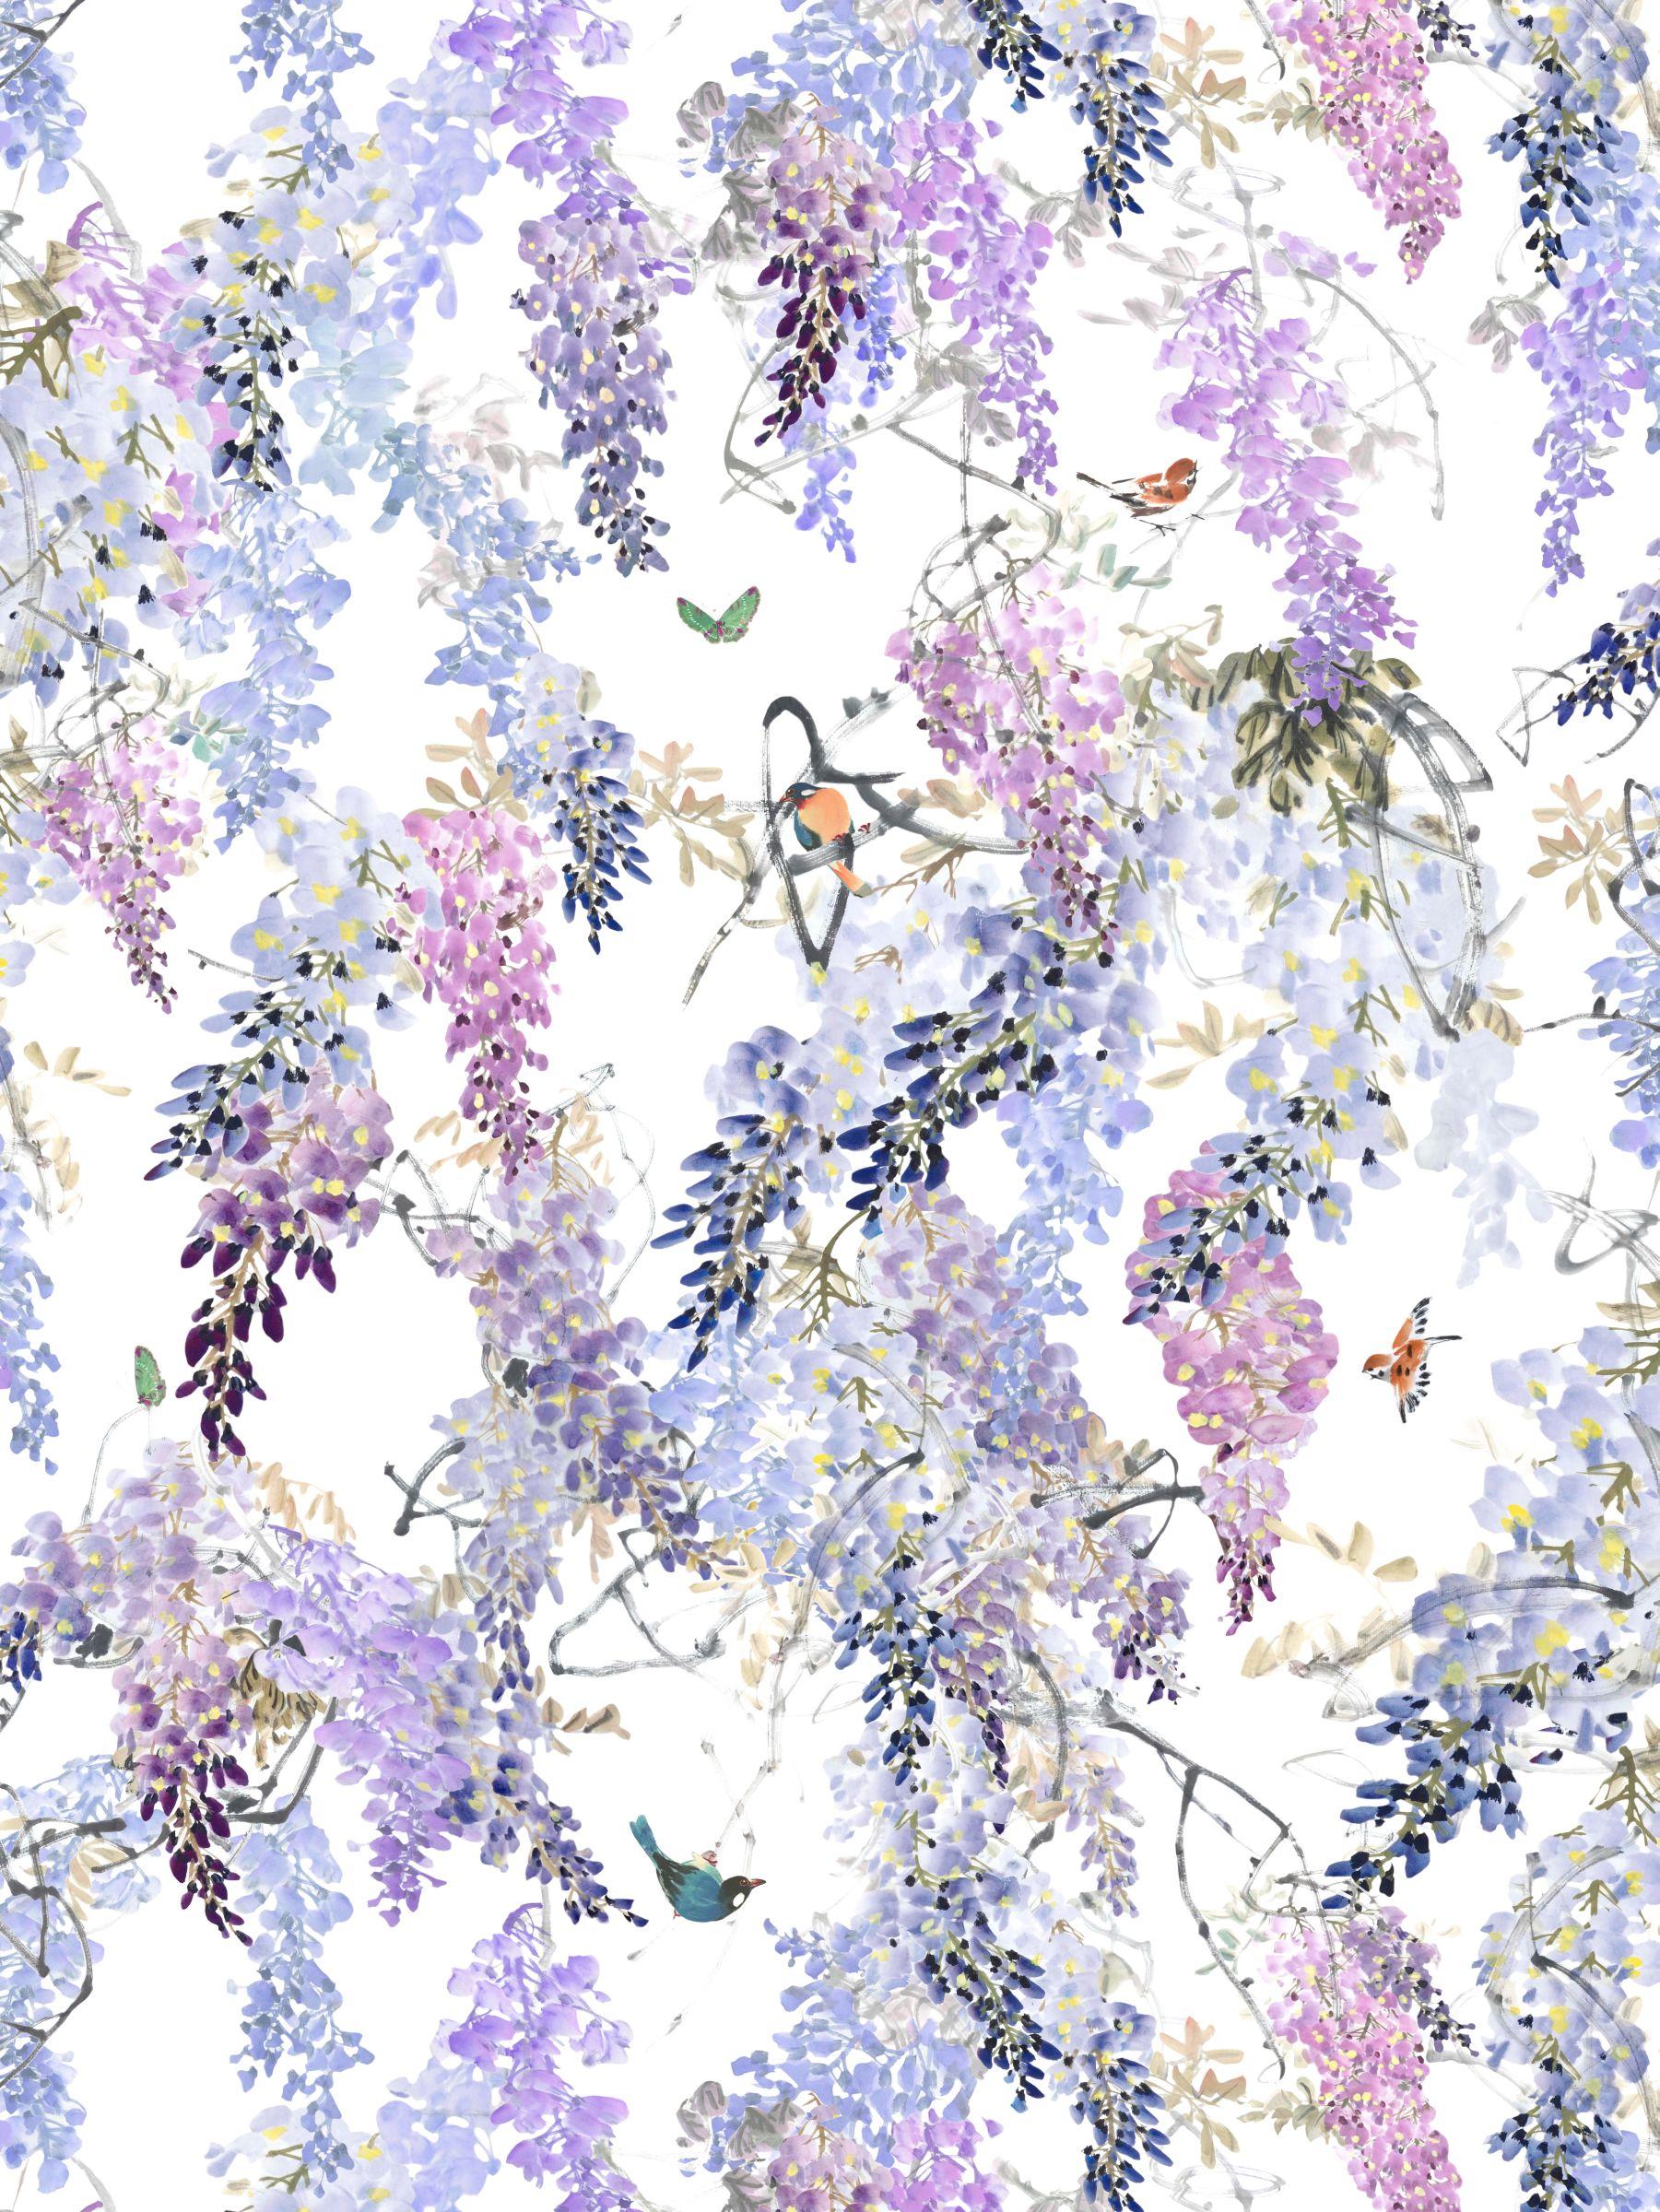 Sanderson Sanderson Waterperry Wisteria Falls Wallpaper Lilac 216296, Panel A